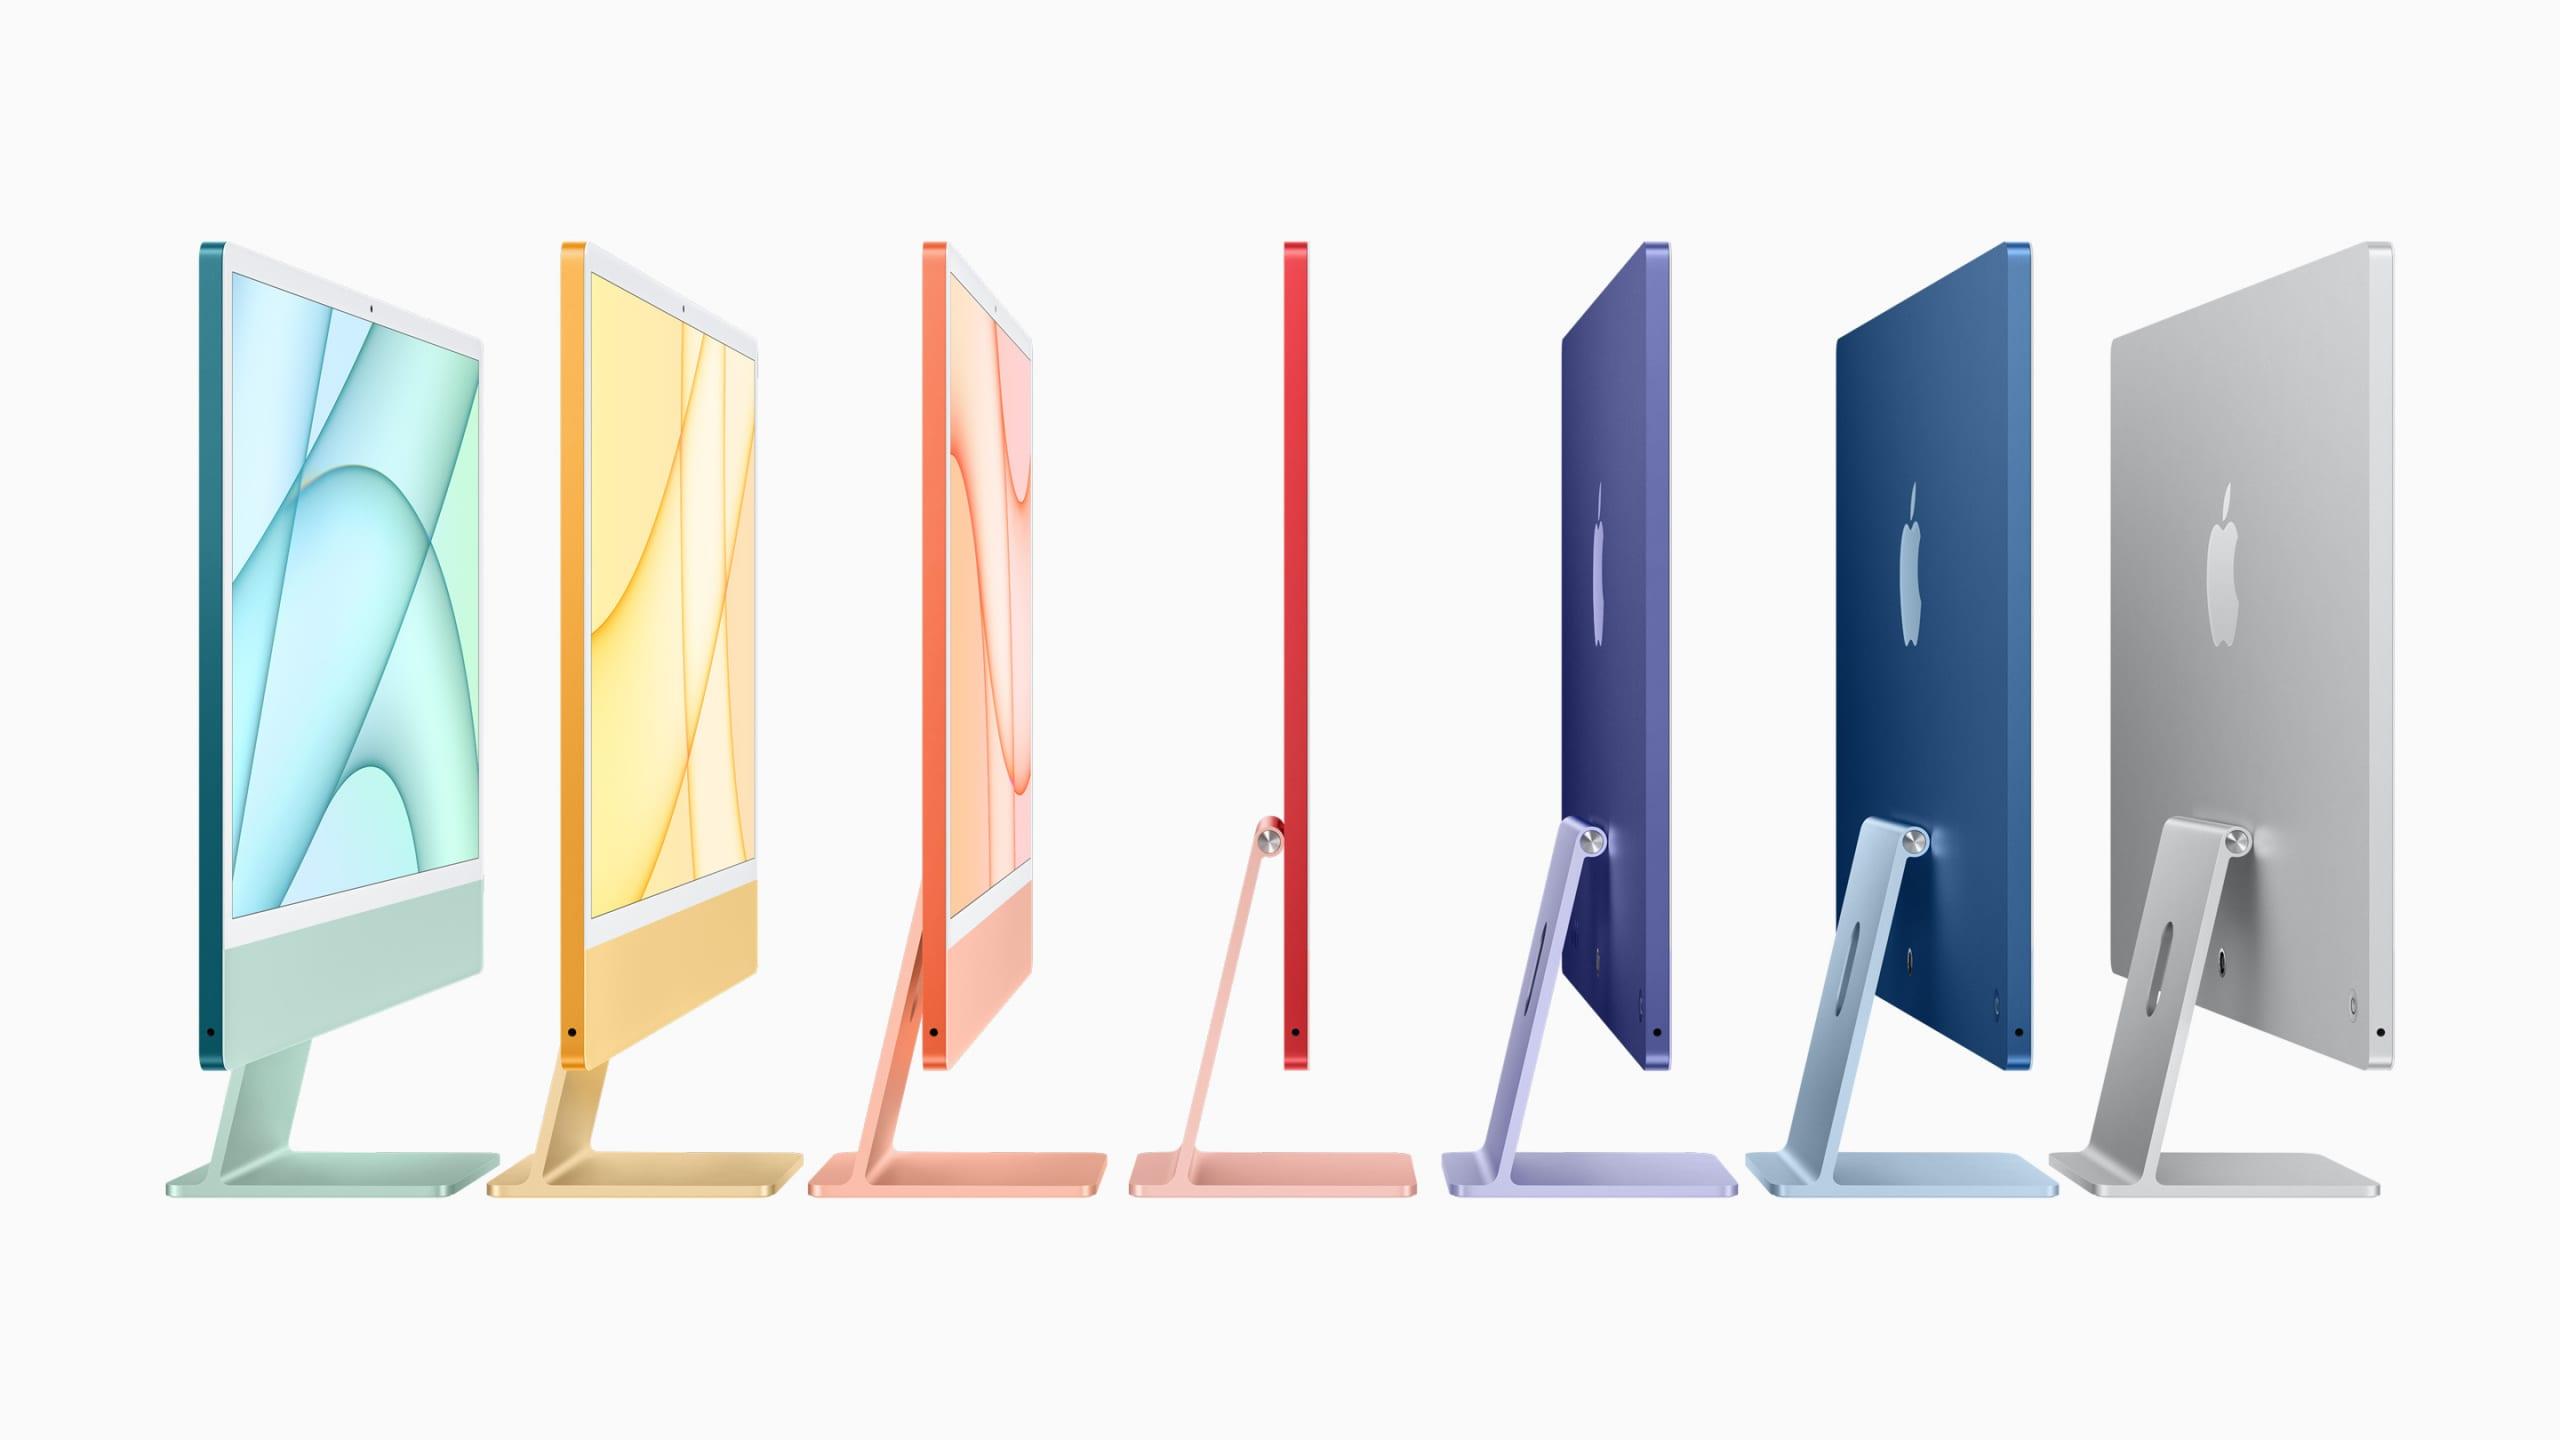 New Imac : Mac Pro 2018 (or 2019) preview - Macworld UK ...